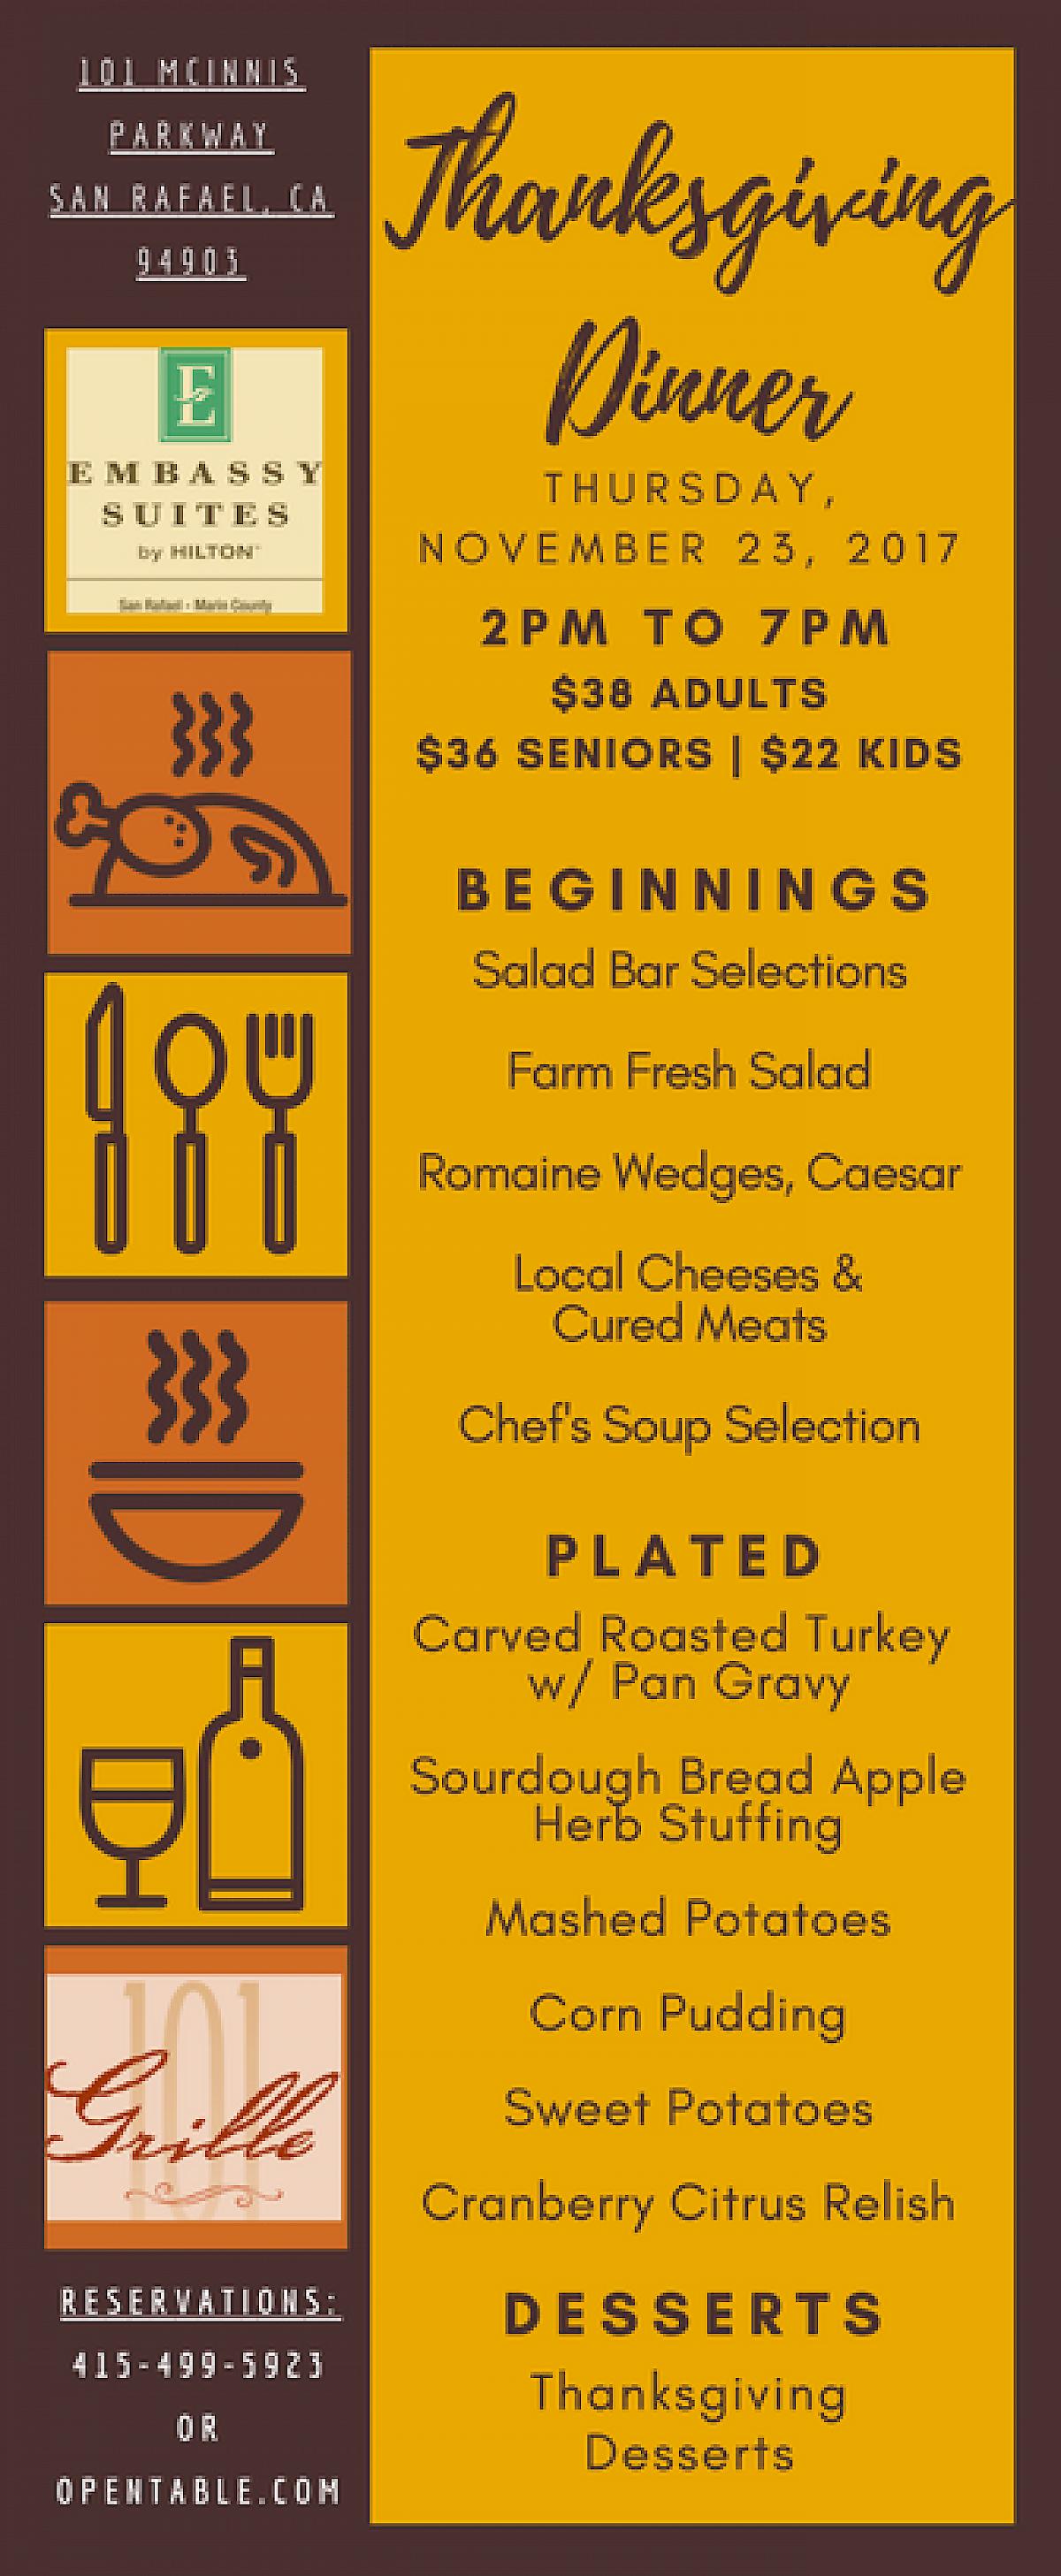 Thanksgiving Dinner at Grille 101 - November 2017 | Marin ...